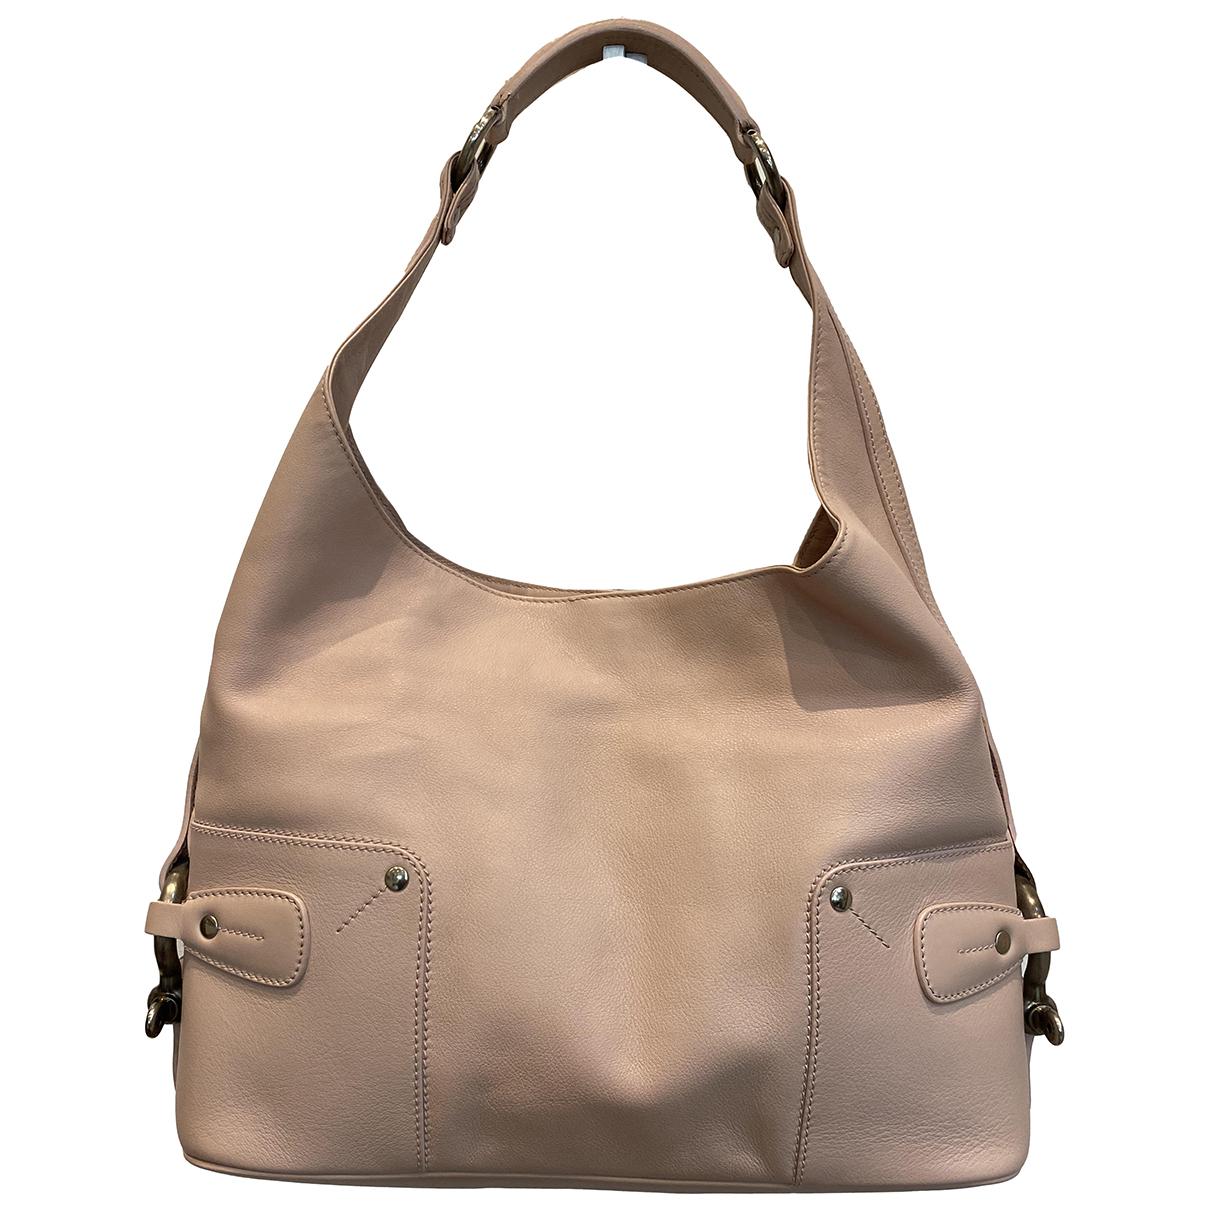 Burberry \N Pink Leather handbag for Women \N